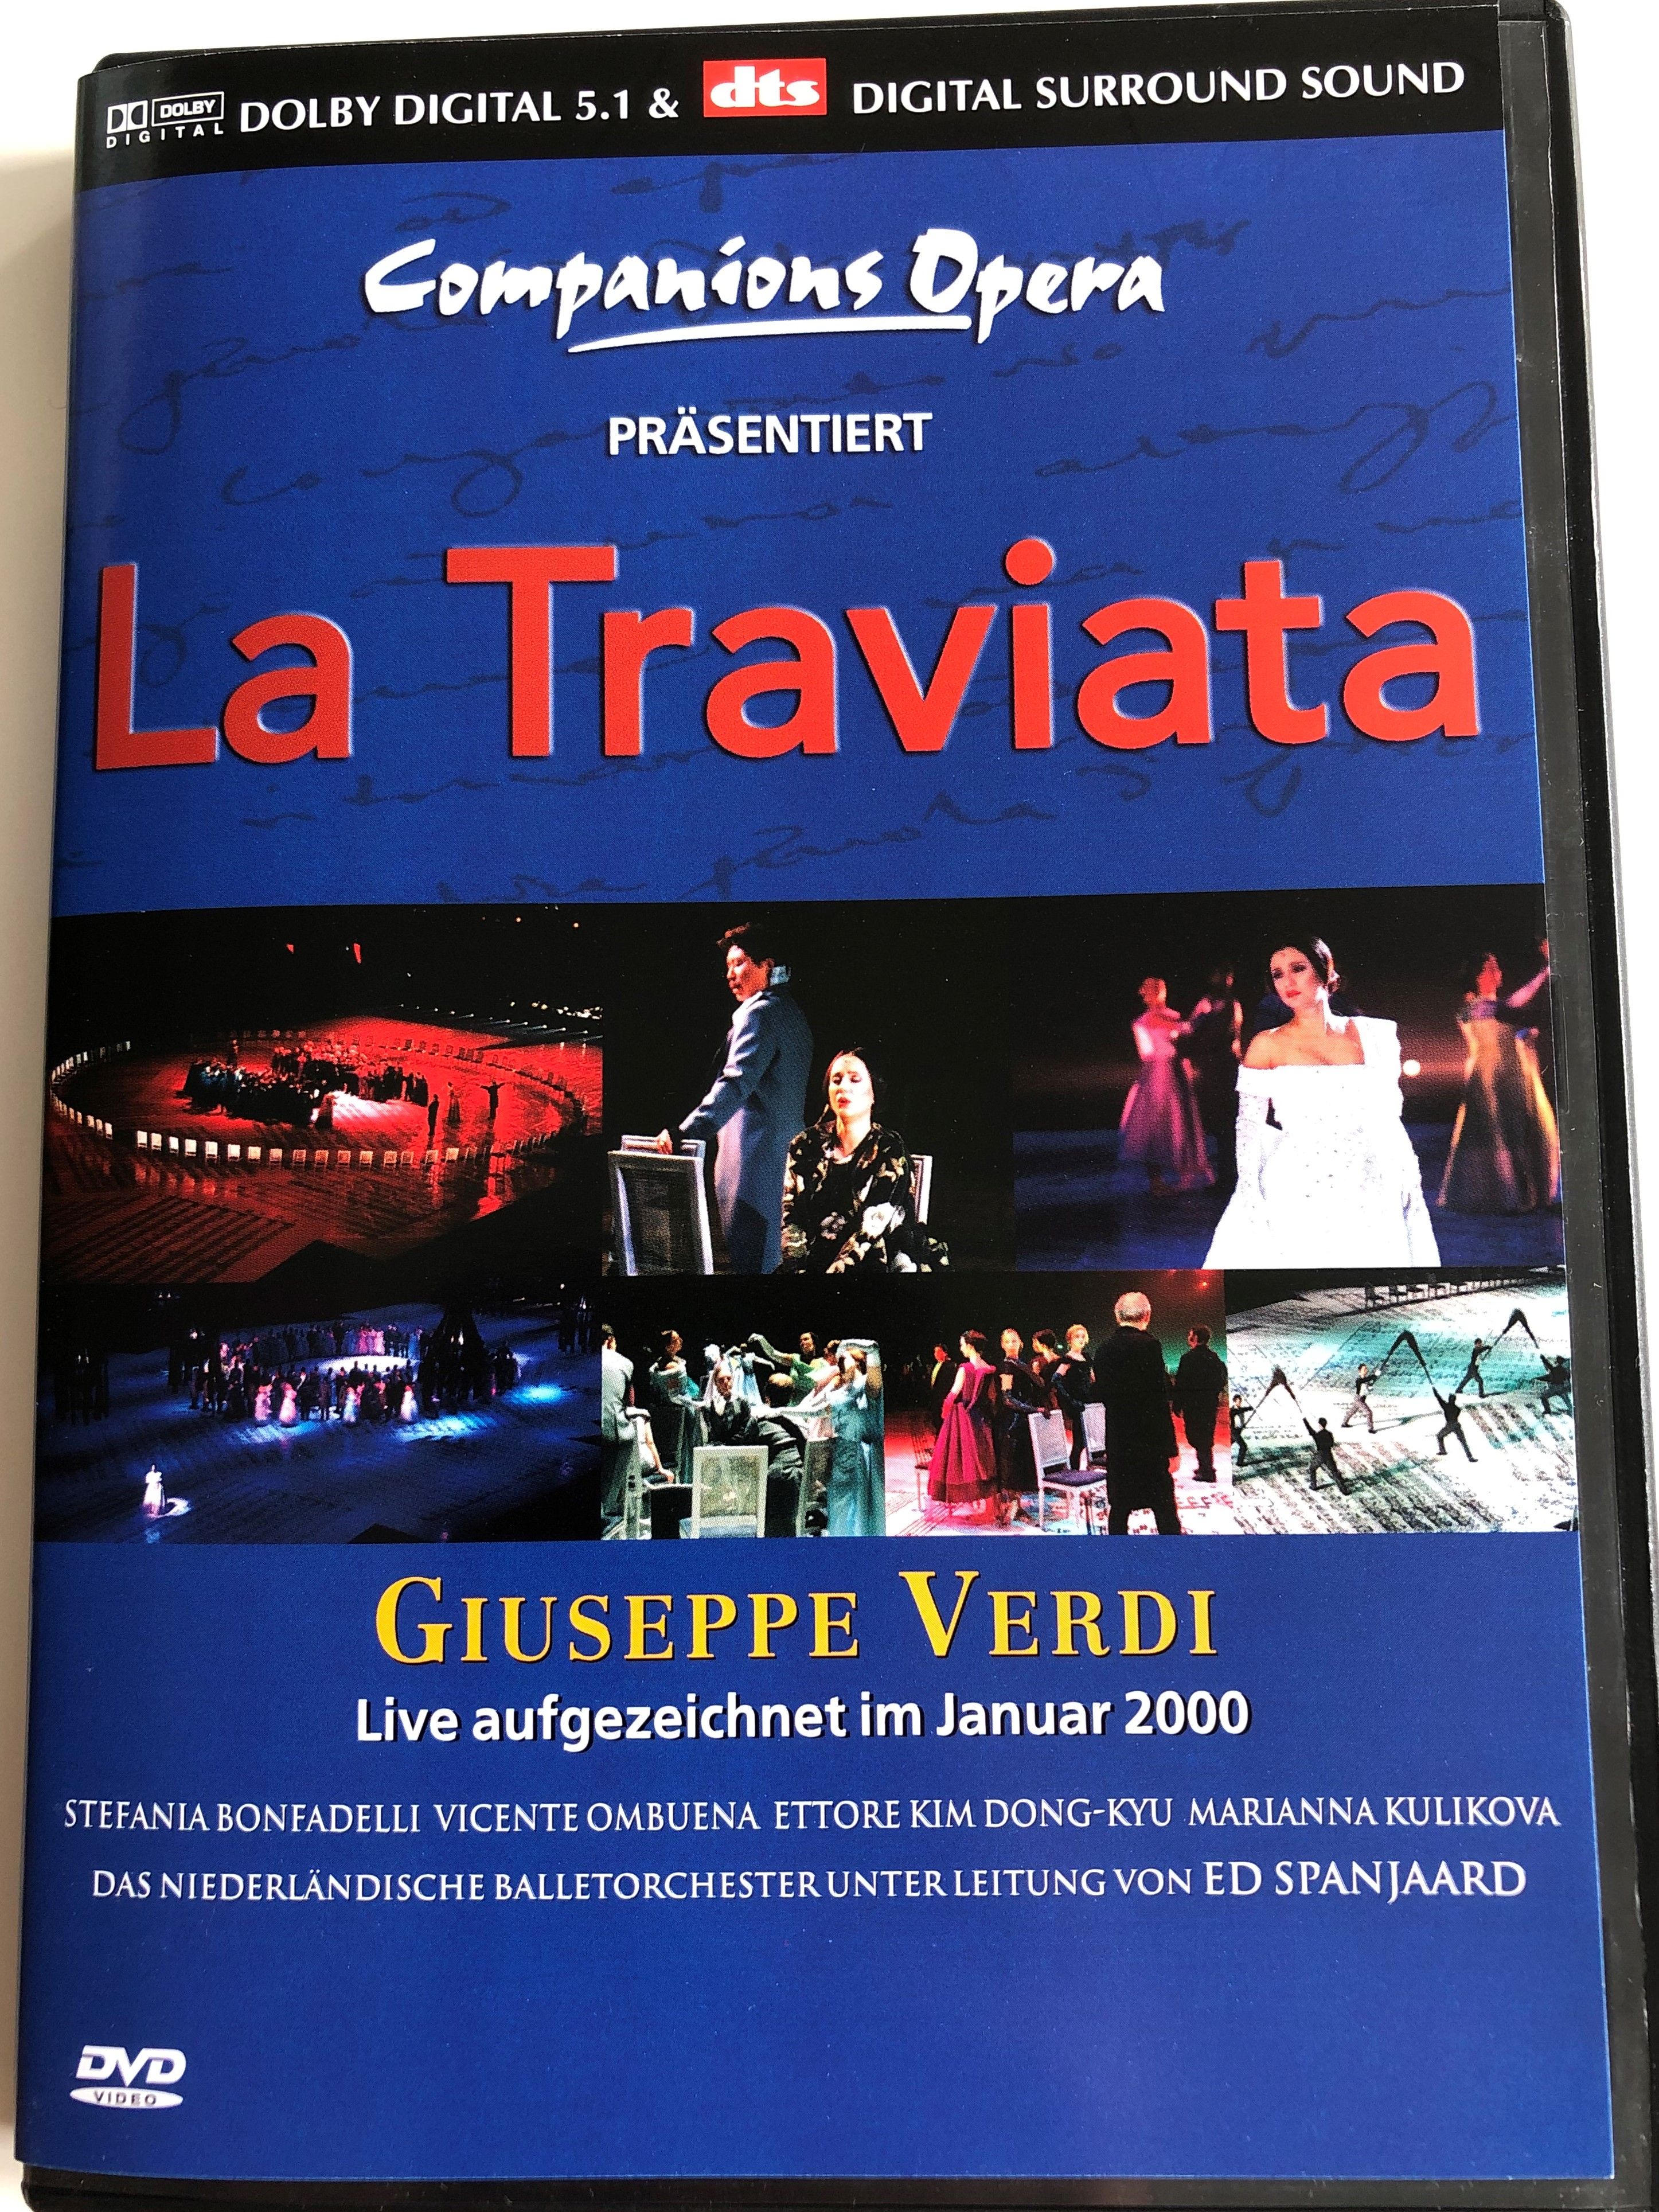 companions-opera-pr-sentiert-la-traviata-giuseppe-verdi-live-aufgezeichnet-im-januar-2000-stefania-bonfadelli-vicente-ombuena-ettore-kim-dong-kyu-marianna-kulikova-niederl-ndische-balletorchester-unter-leitung-von-ed-s-1-.jpg